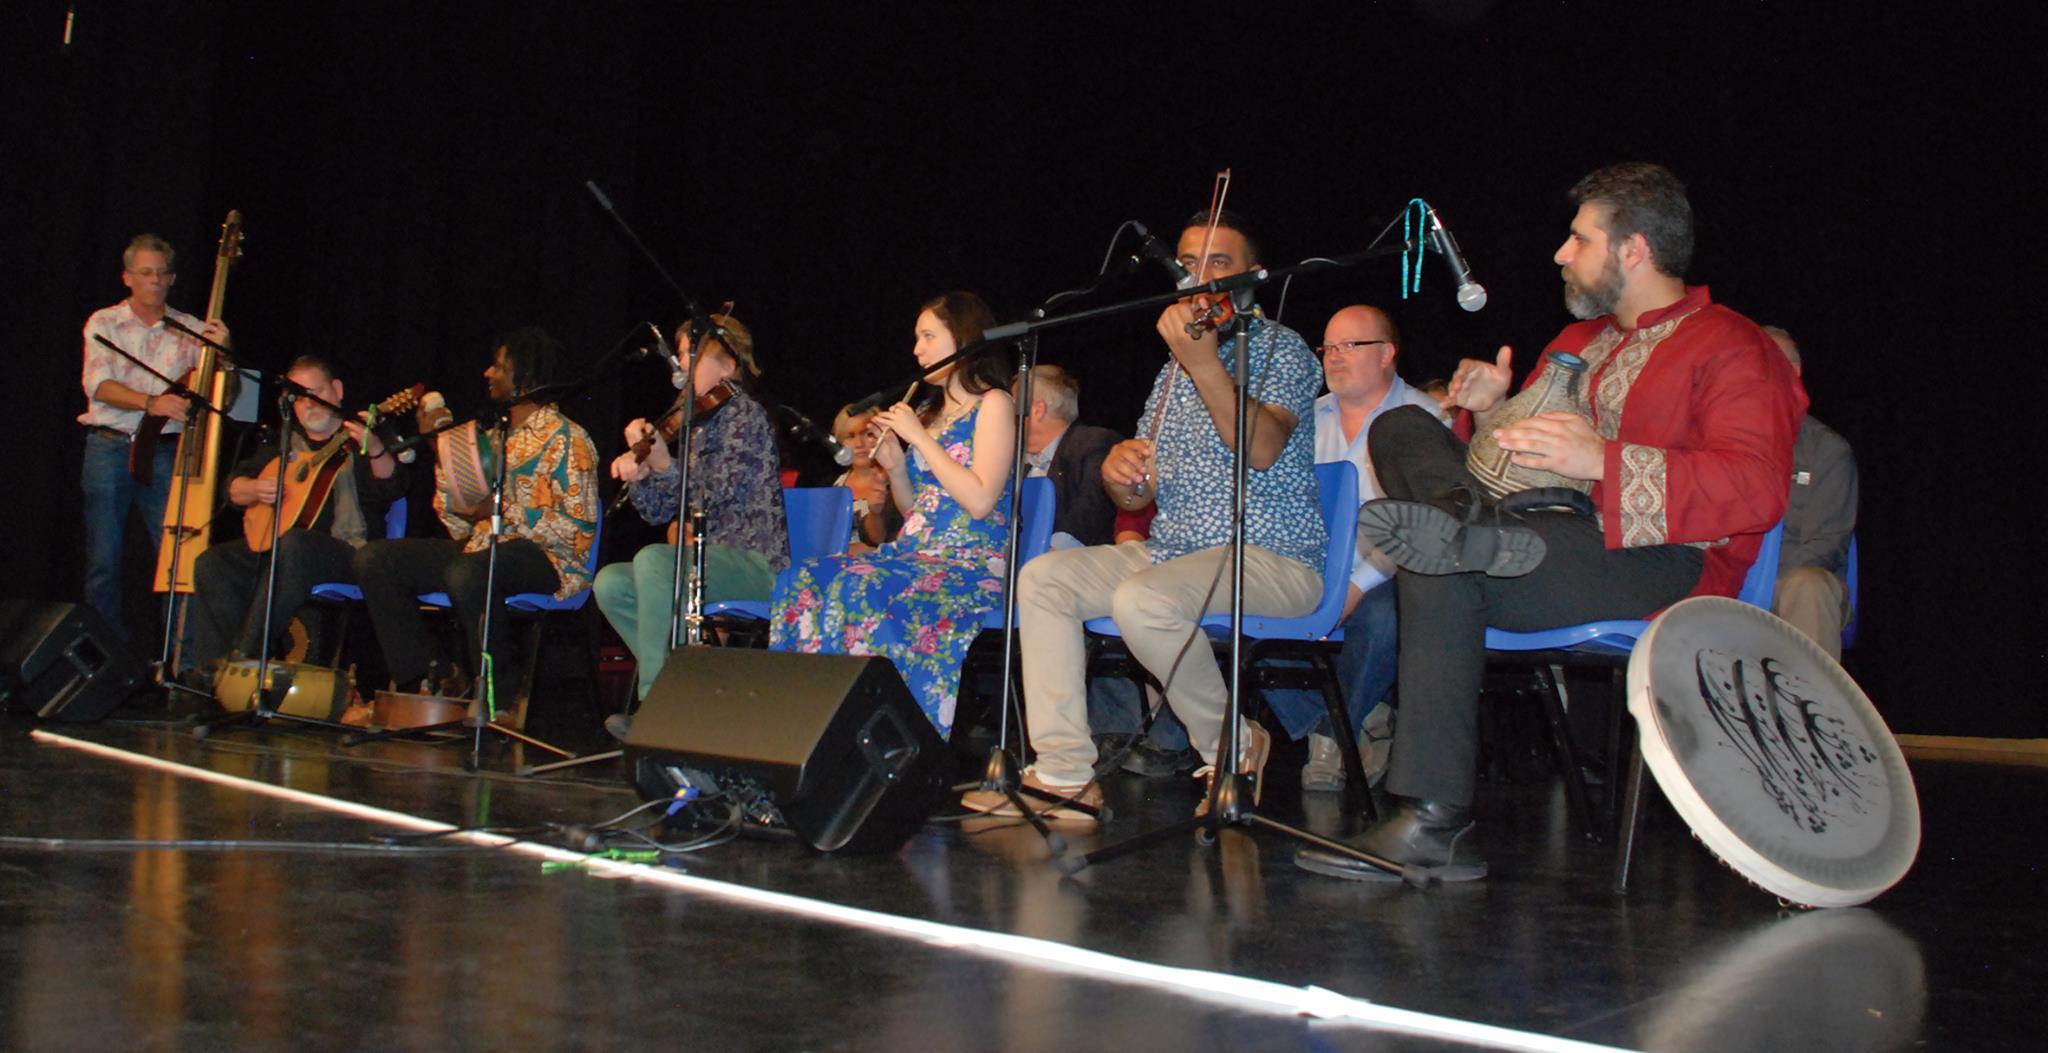 Just some of the members of Ensemble Diaspora!